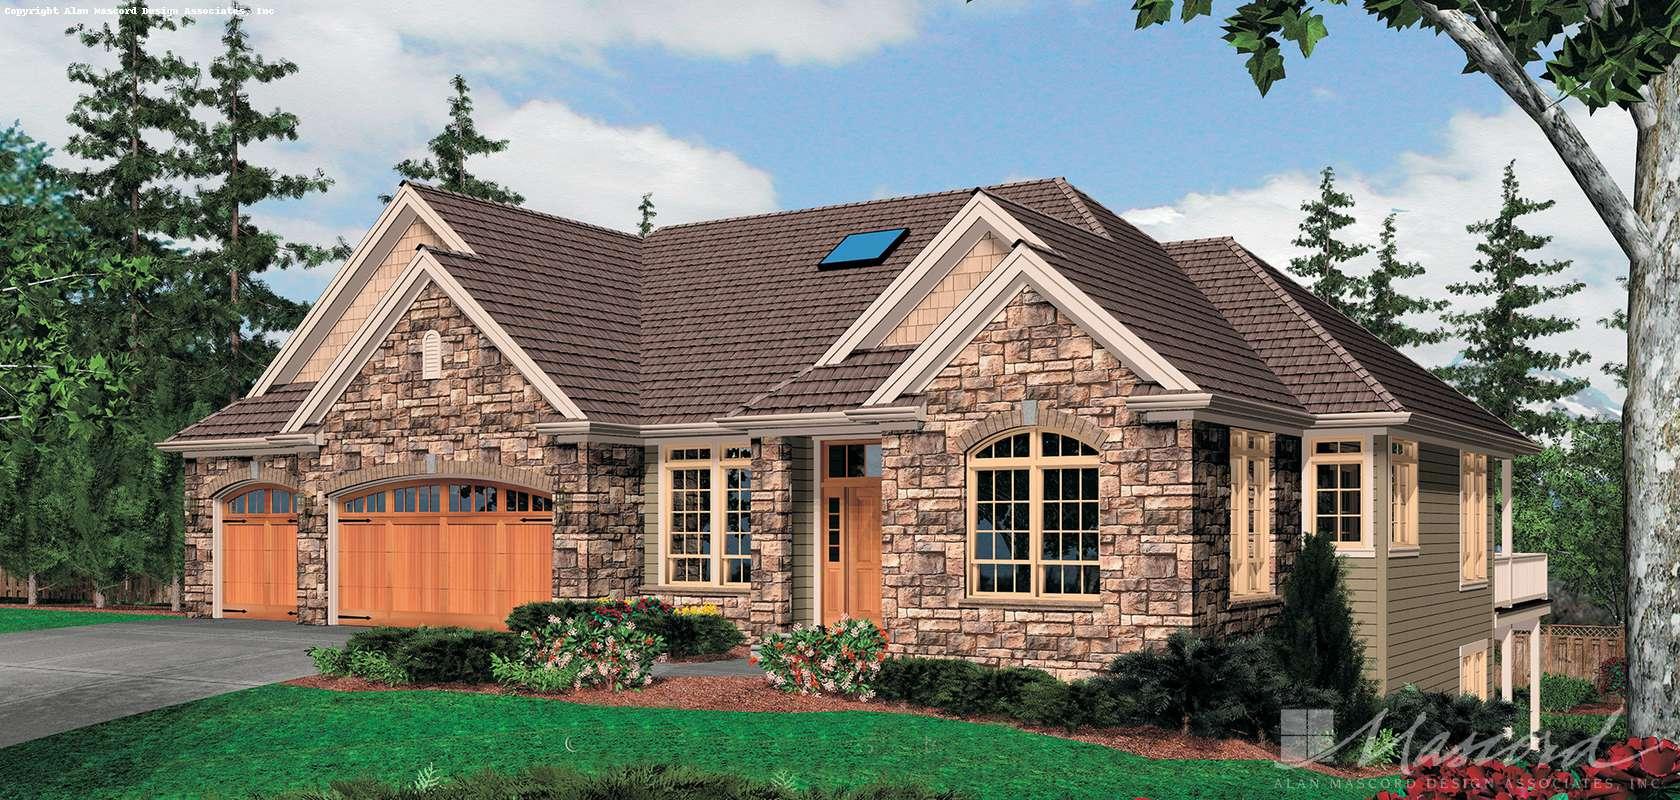 Mascord House Plan 1320: The Granseth